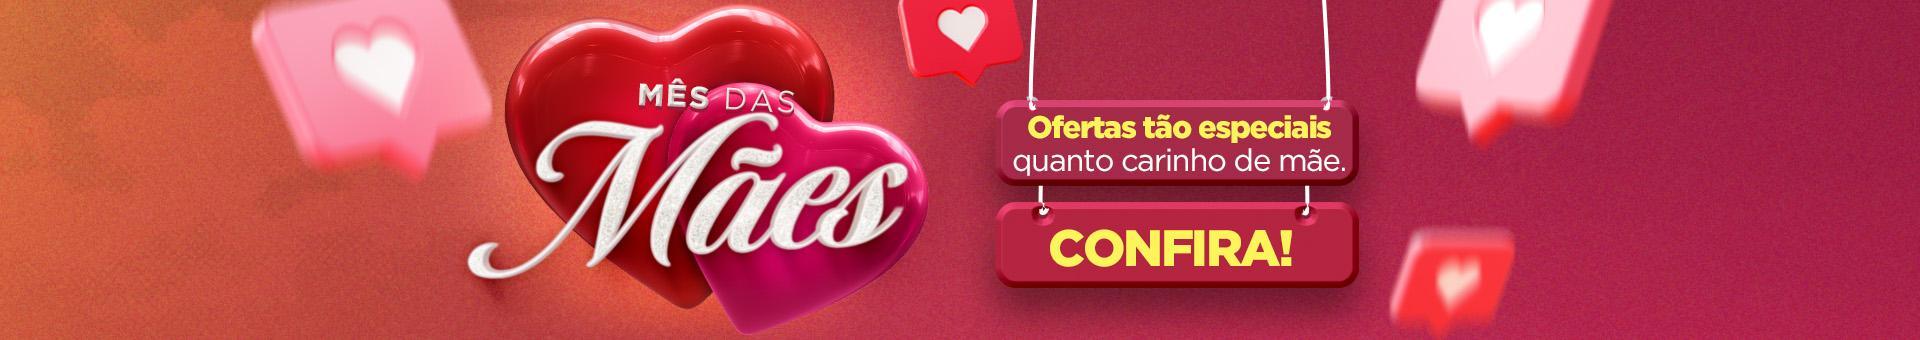 Banner Encarte do Mês Desktop